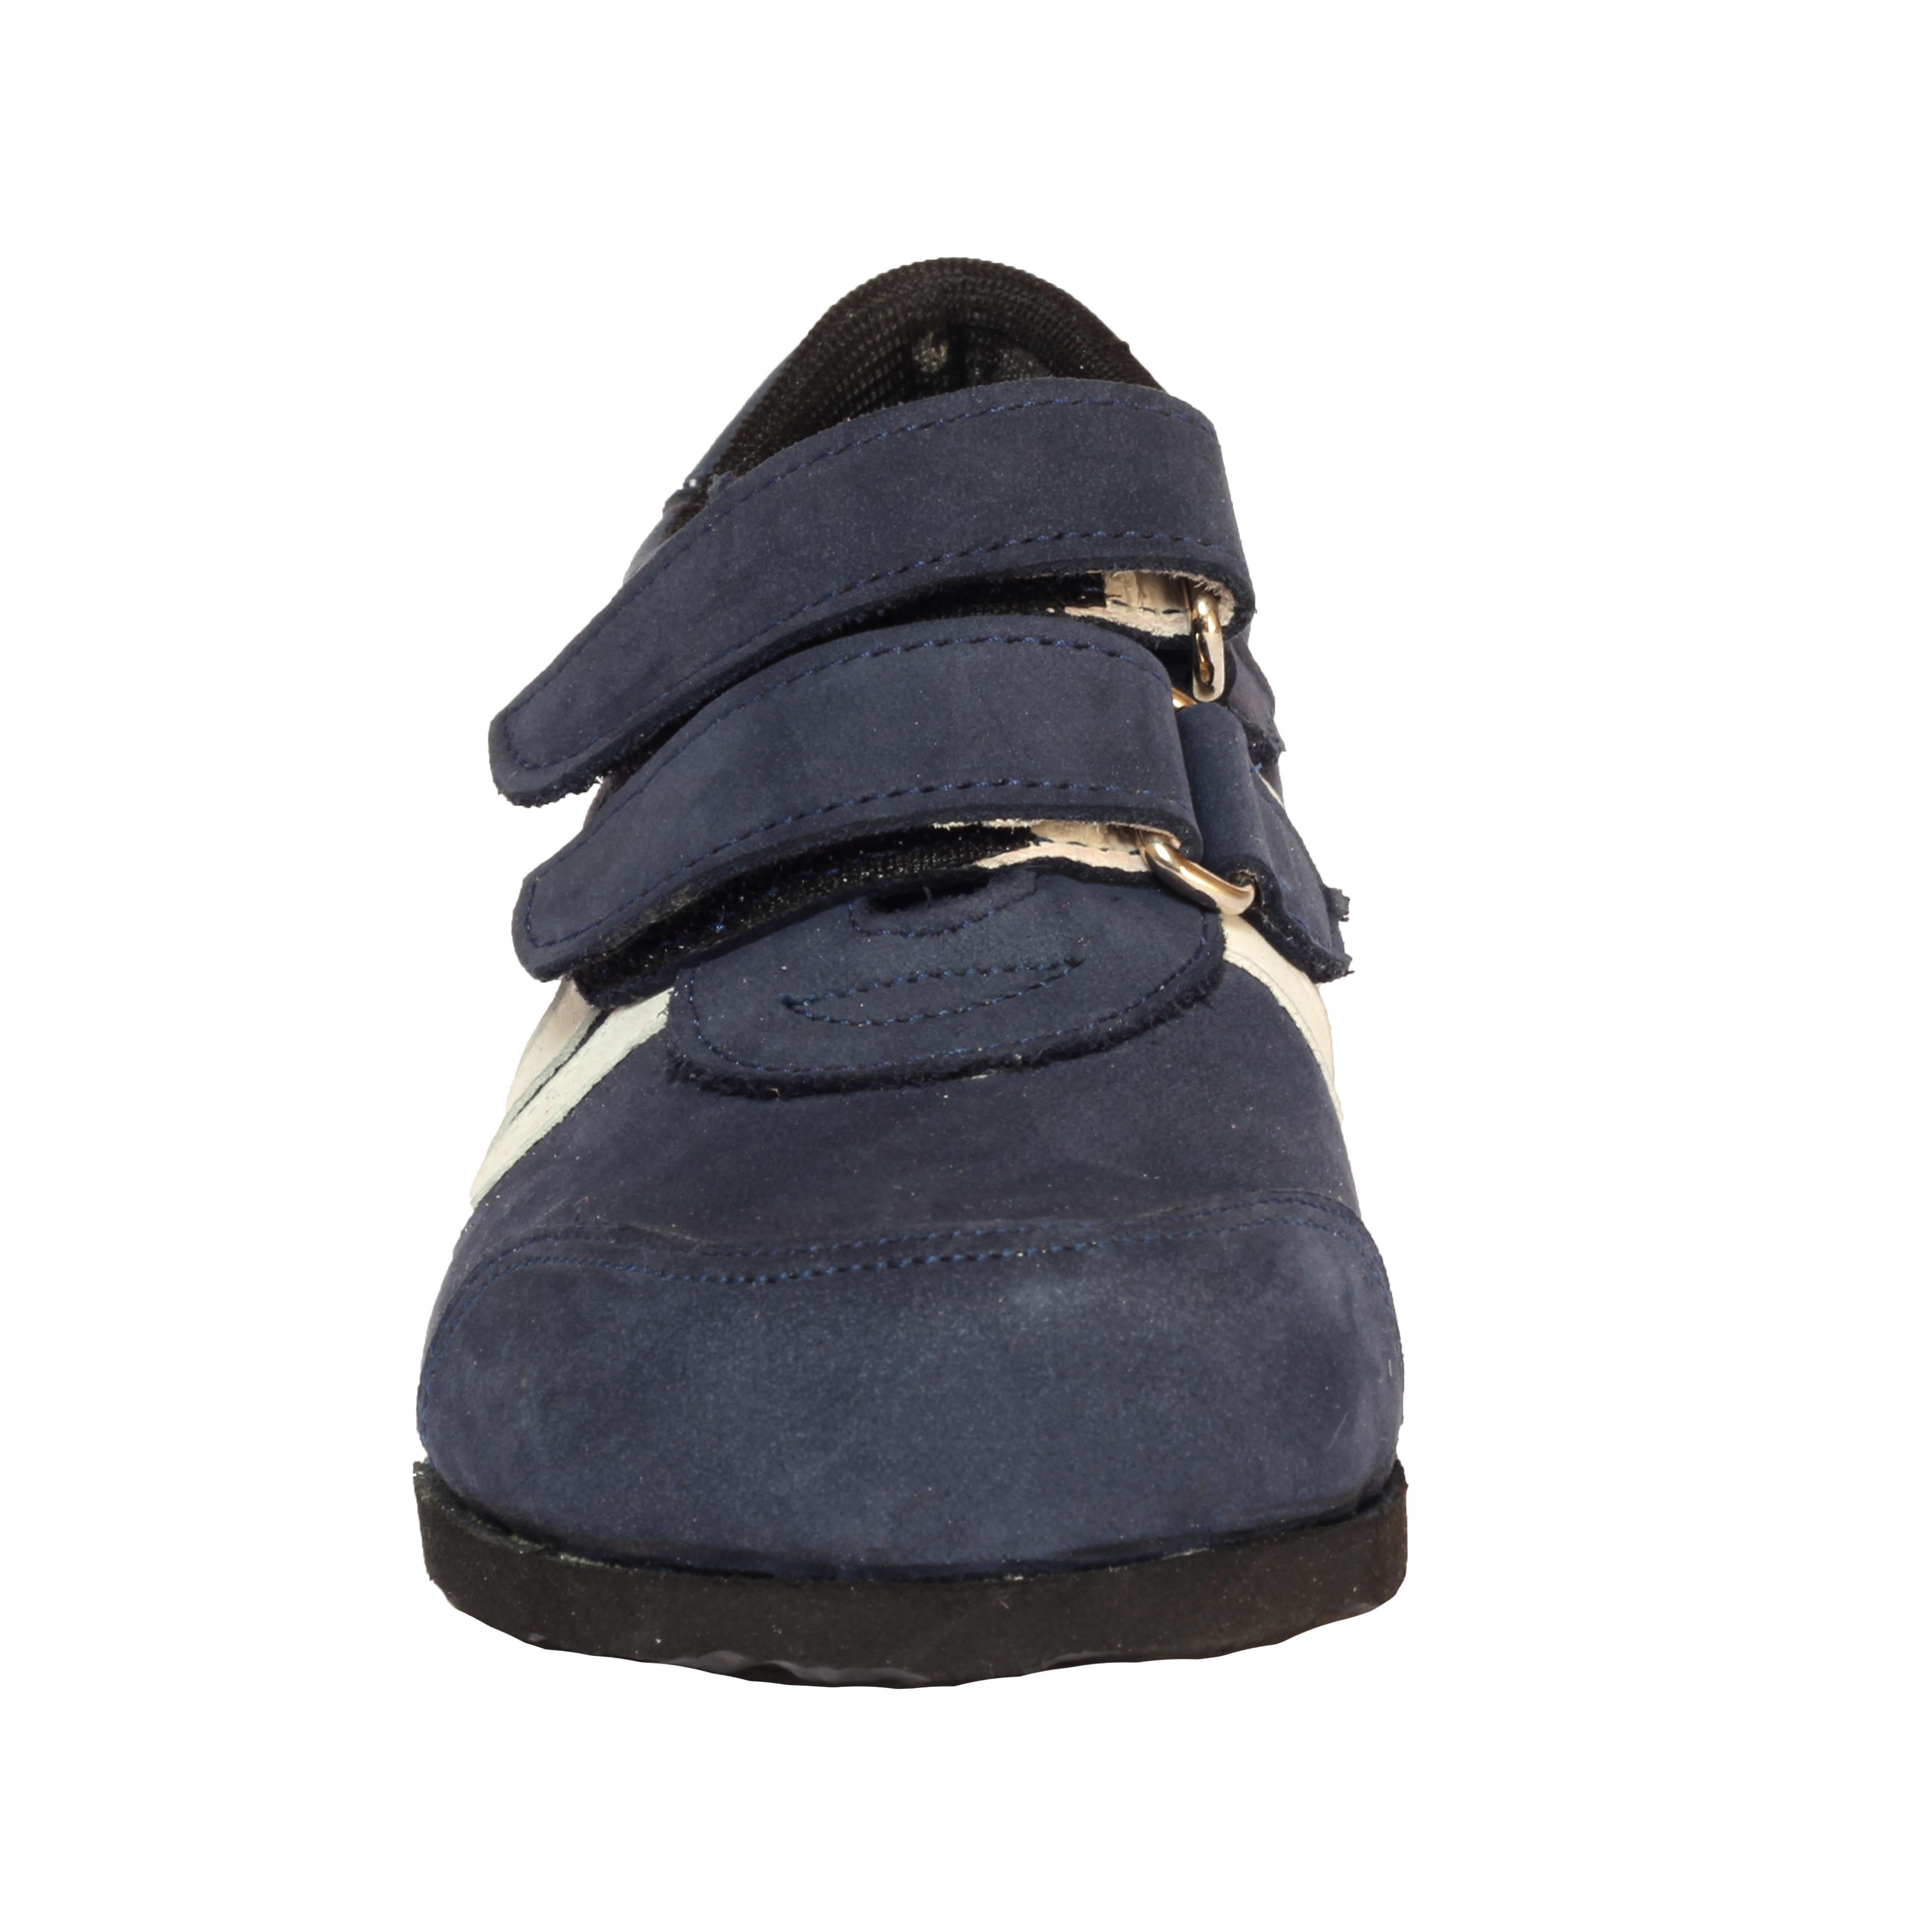 Supinált fiú tépőzáras bőr cipő sport  cb47e61797